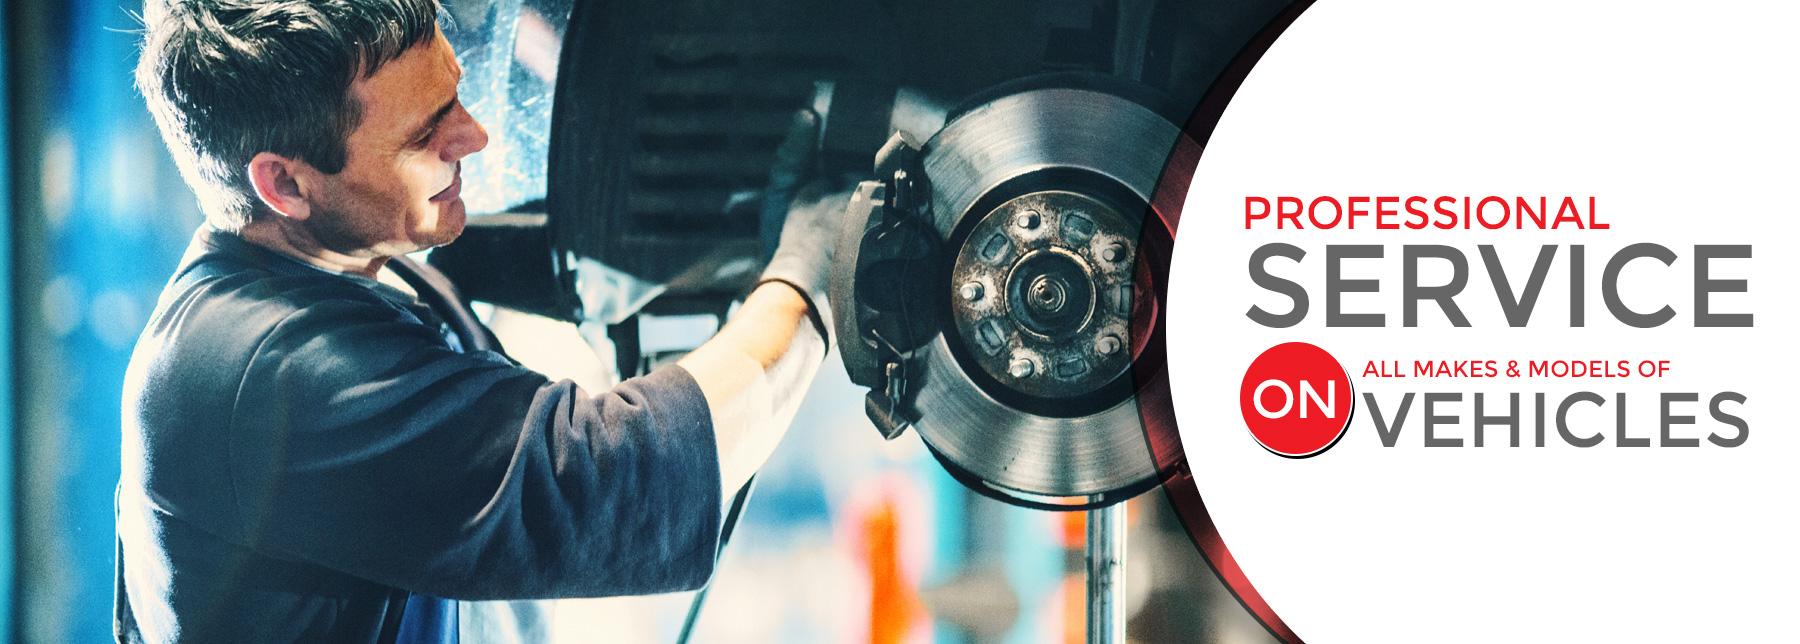 Richies Service Center | Brakes, Brake job, Auto repair